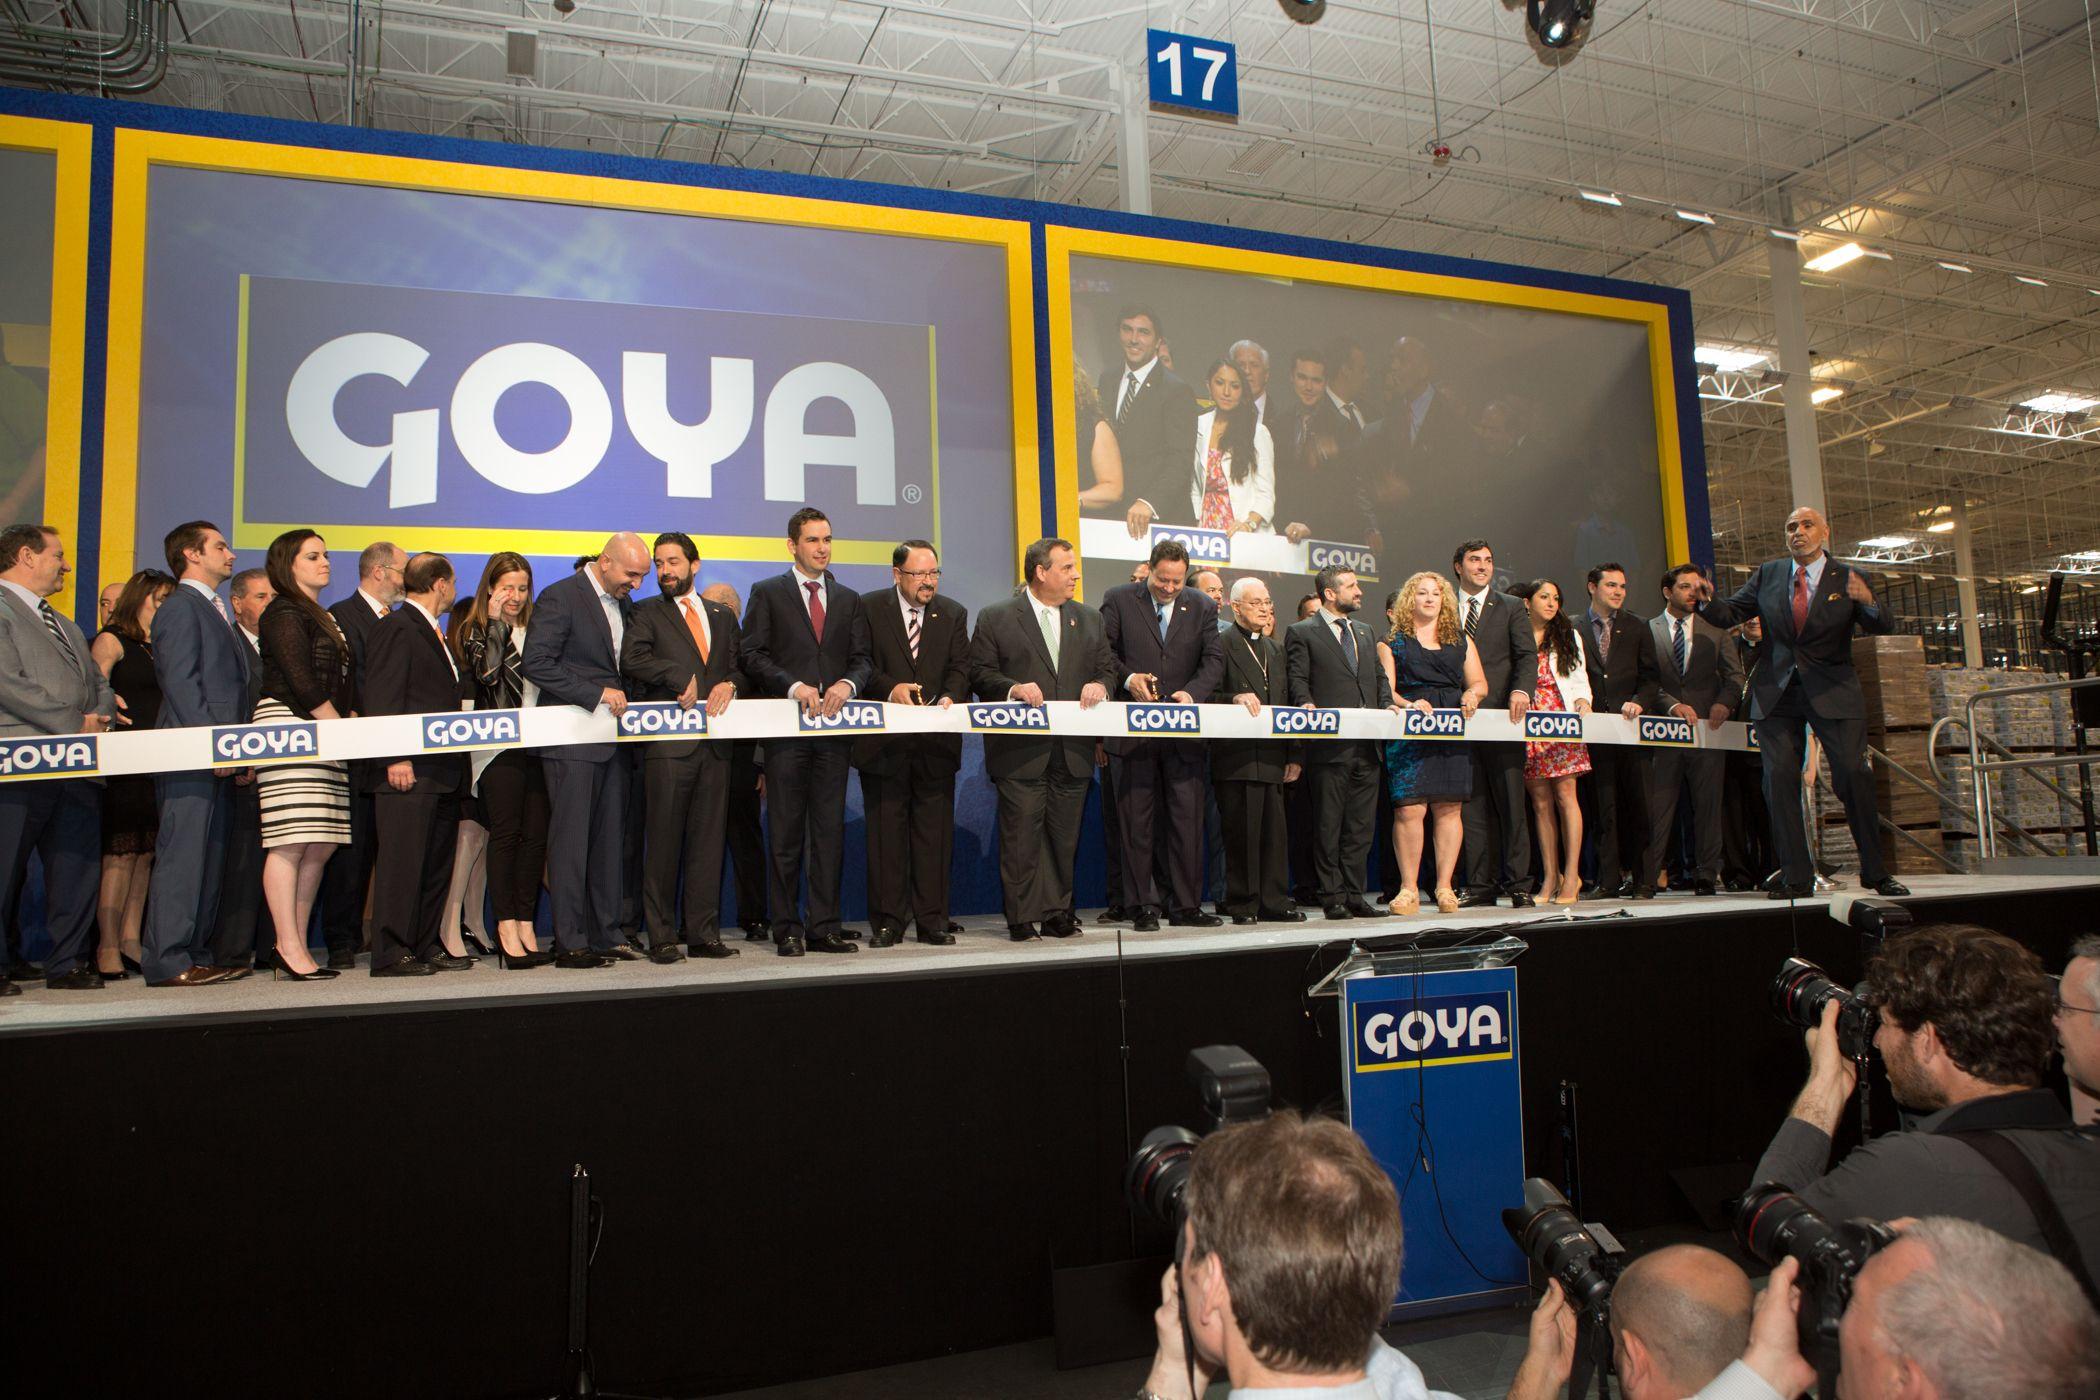 La Grand Familia Goya celebrates the grand opening of